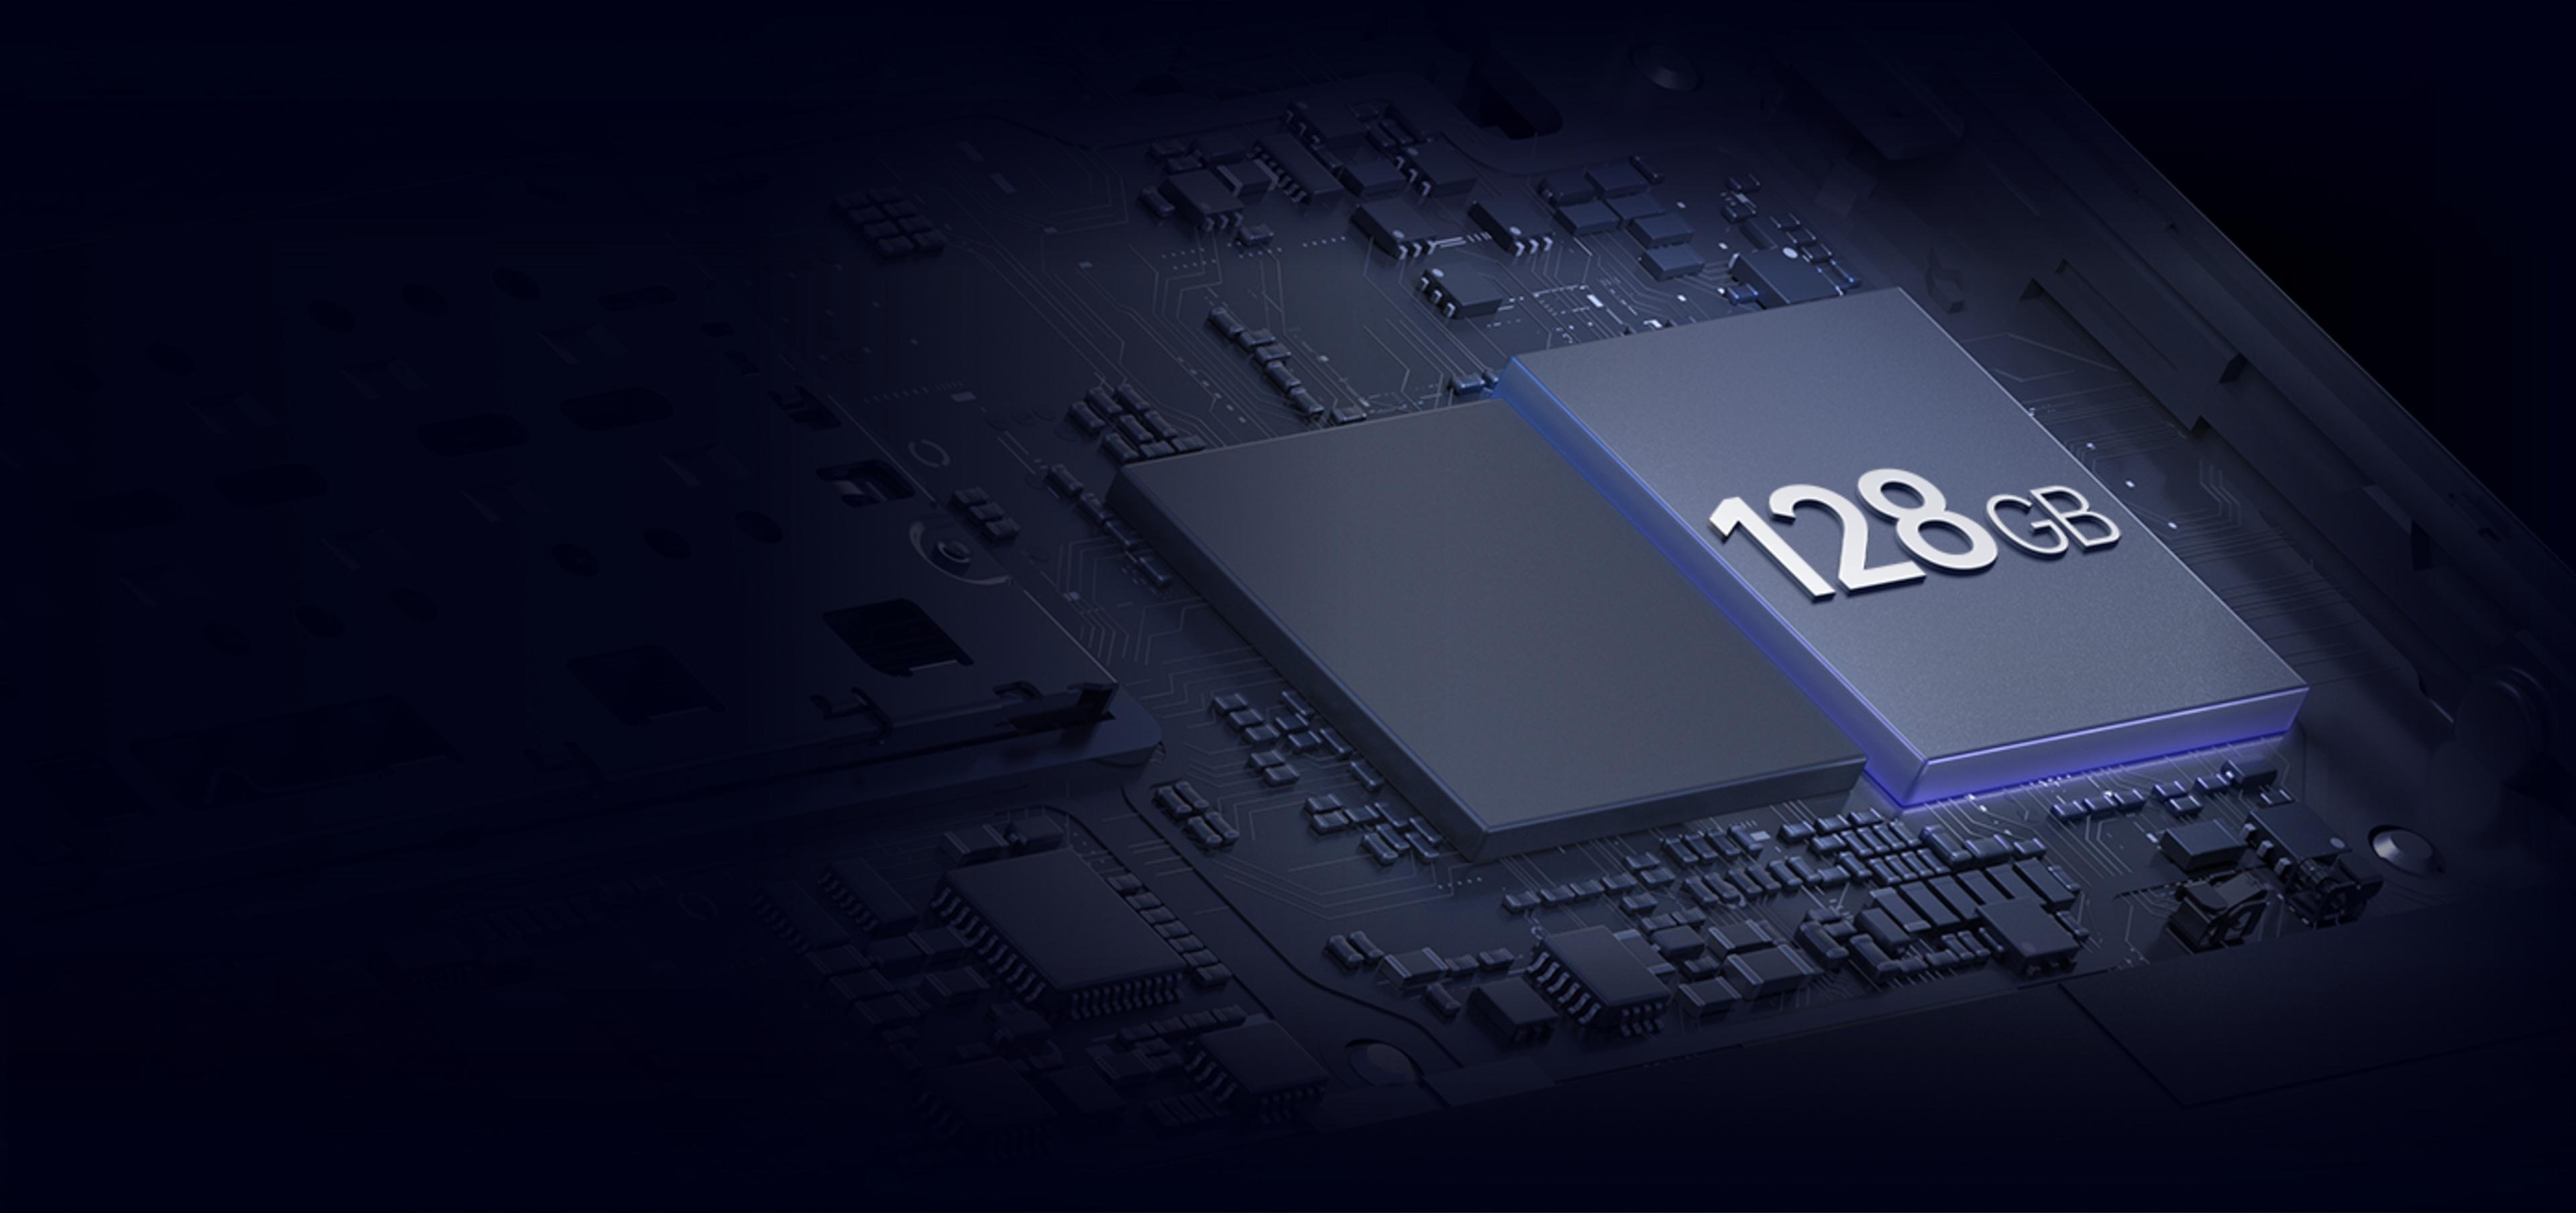 128GB Superb ROM